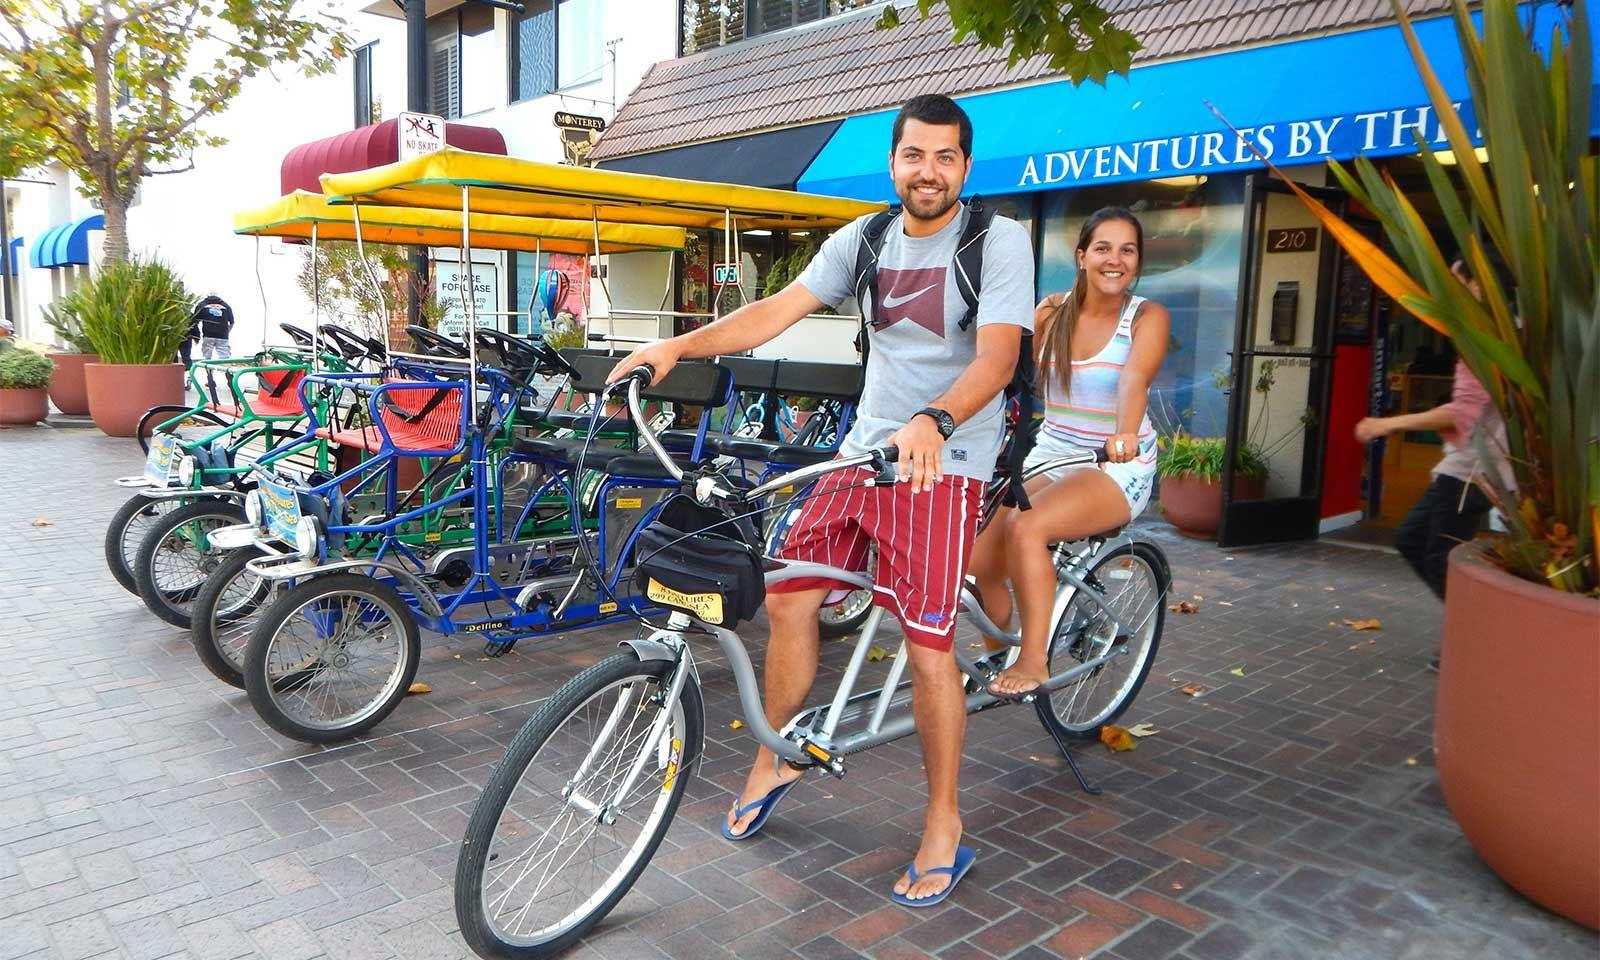 Kayak and bike rental in 2020 kayaking adventure bike